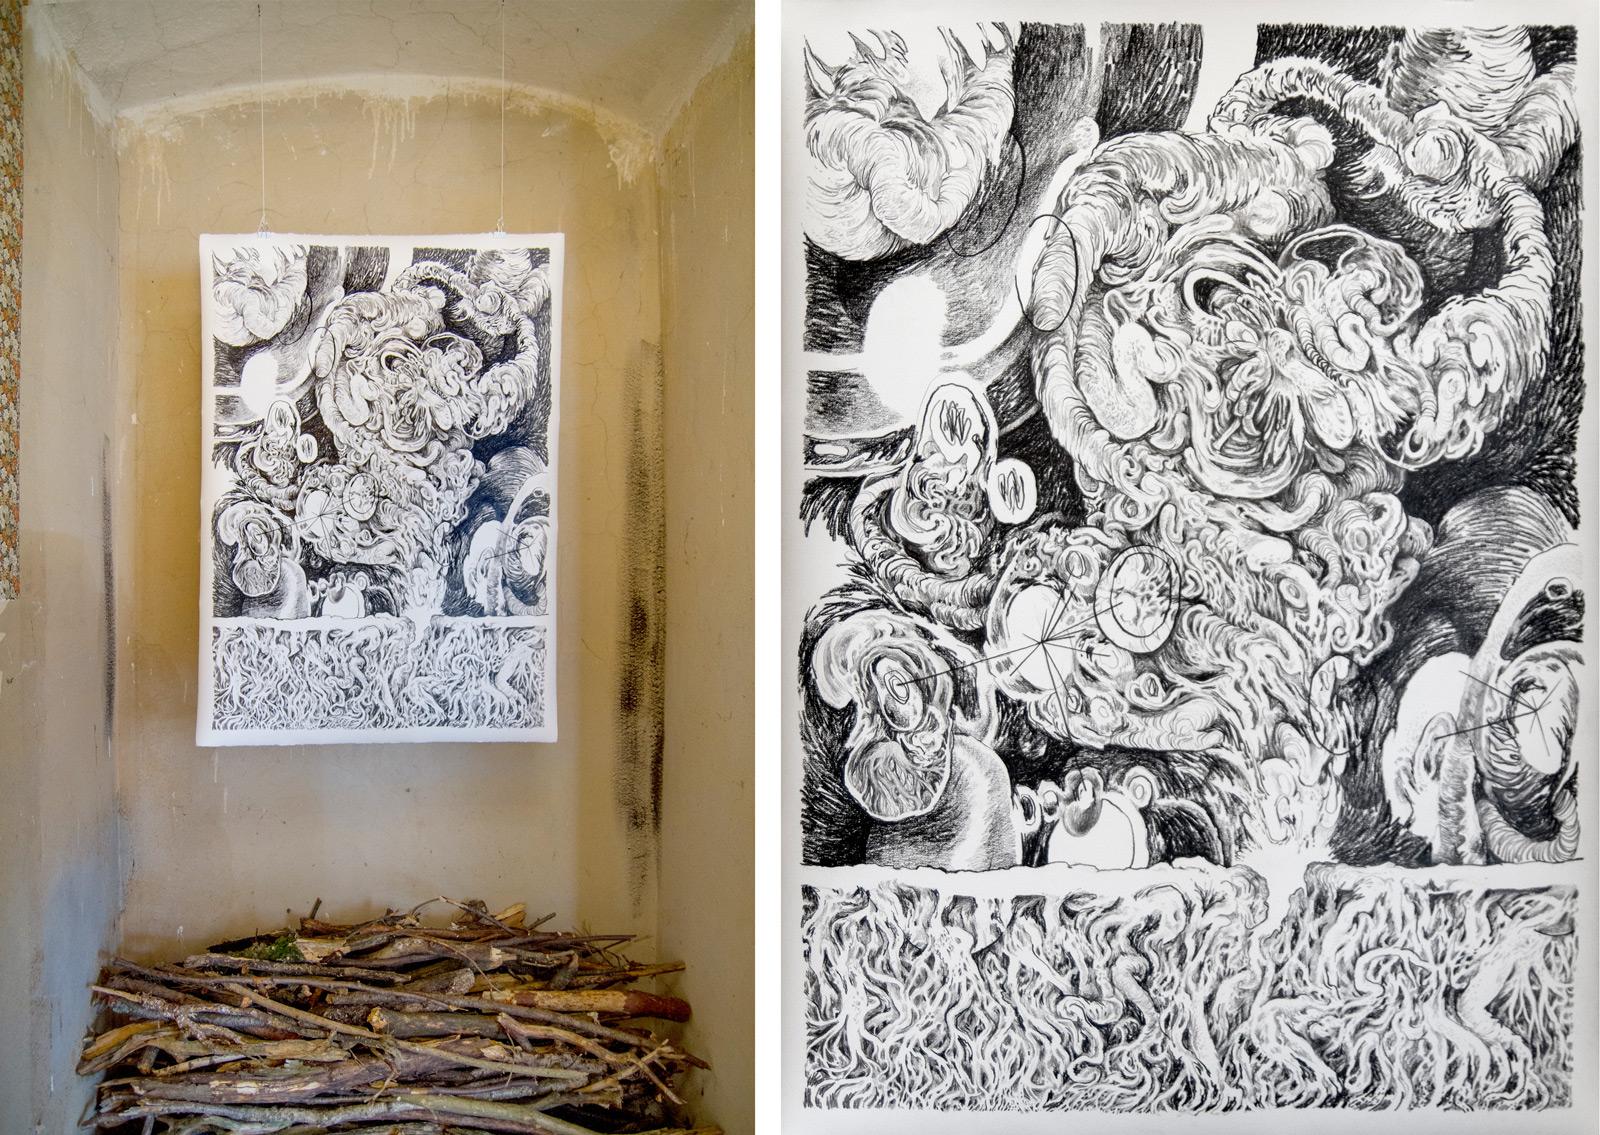 A Life VI, 2014 | Crayon on paper | 76 x 108 cm